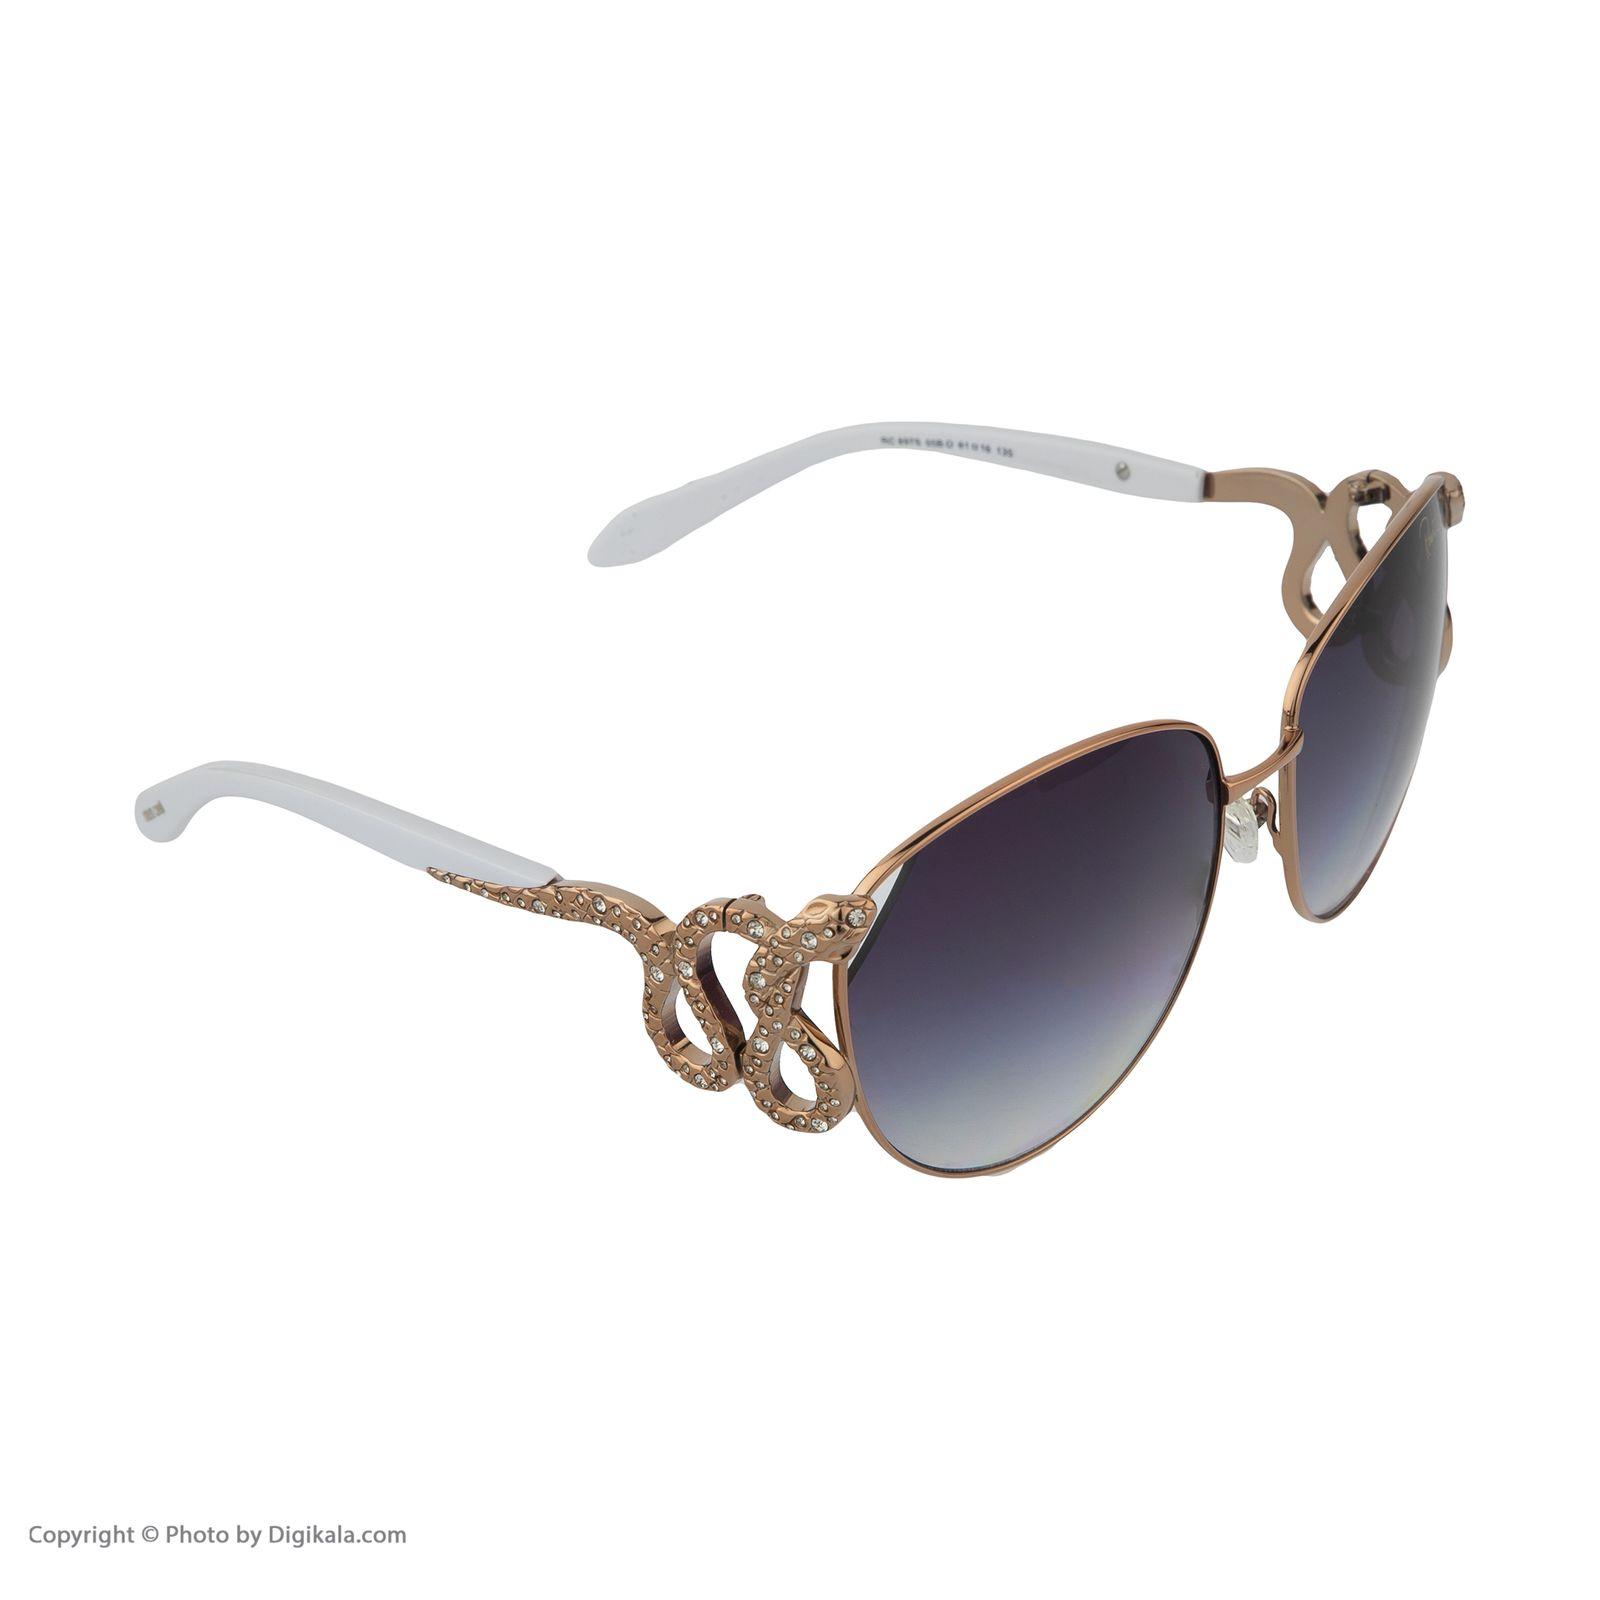 عینک آفتابی زنانه روبرتو کاوالی مدل 897 -  - 3